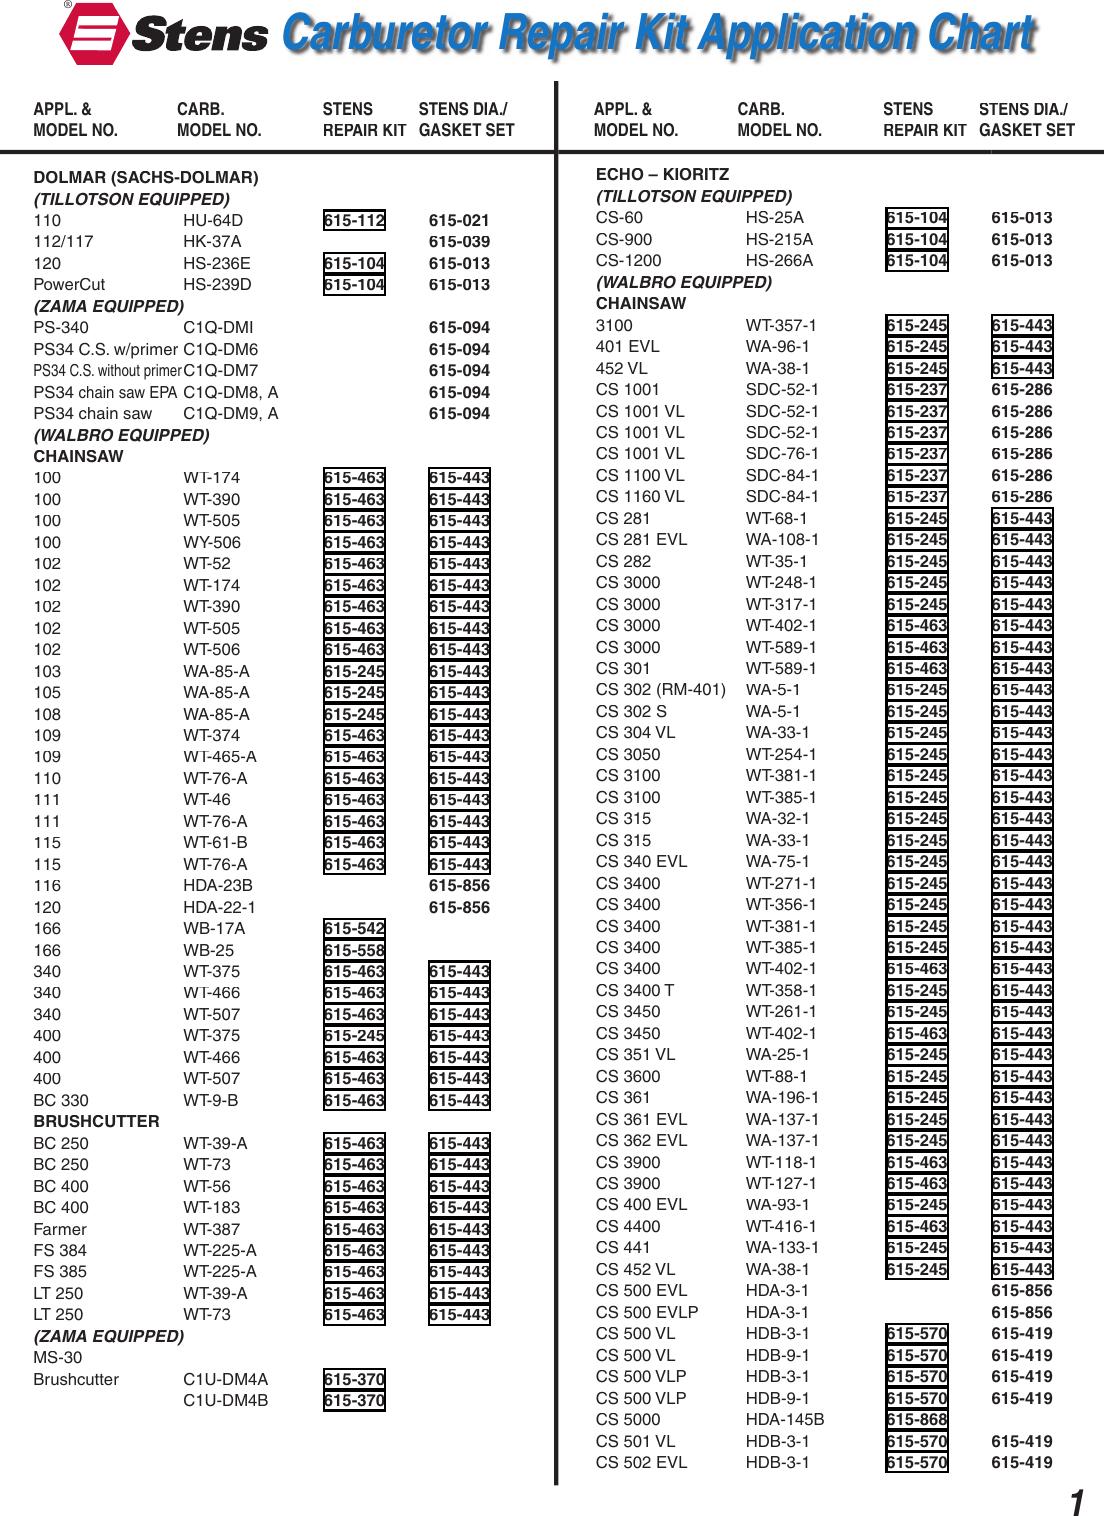 Sachs Dolmar 109 Parts Manual